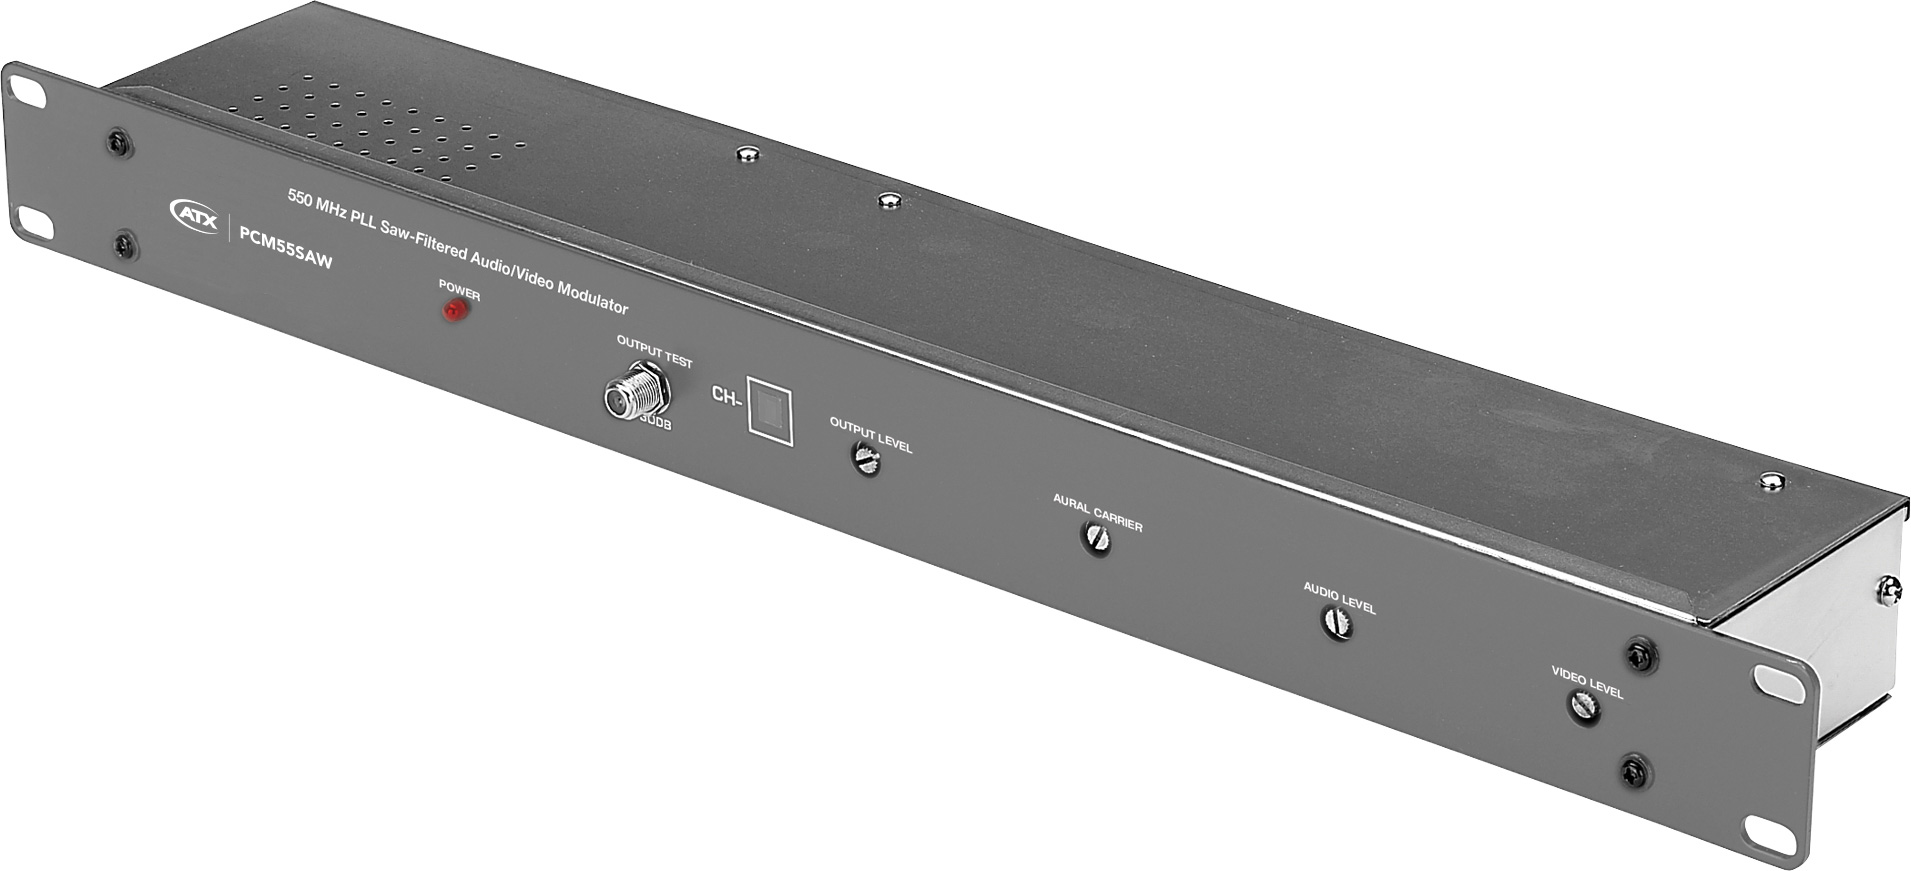 1 Channel Crystal A/V Modulator - Channel HHH PM-PCM55SAW-HHH